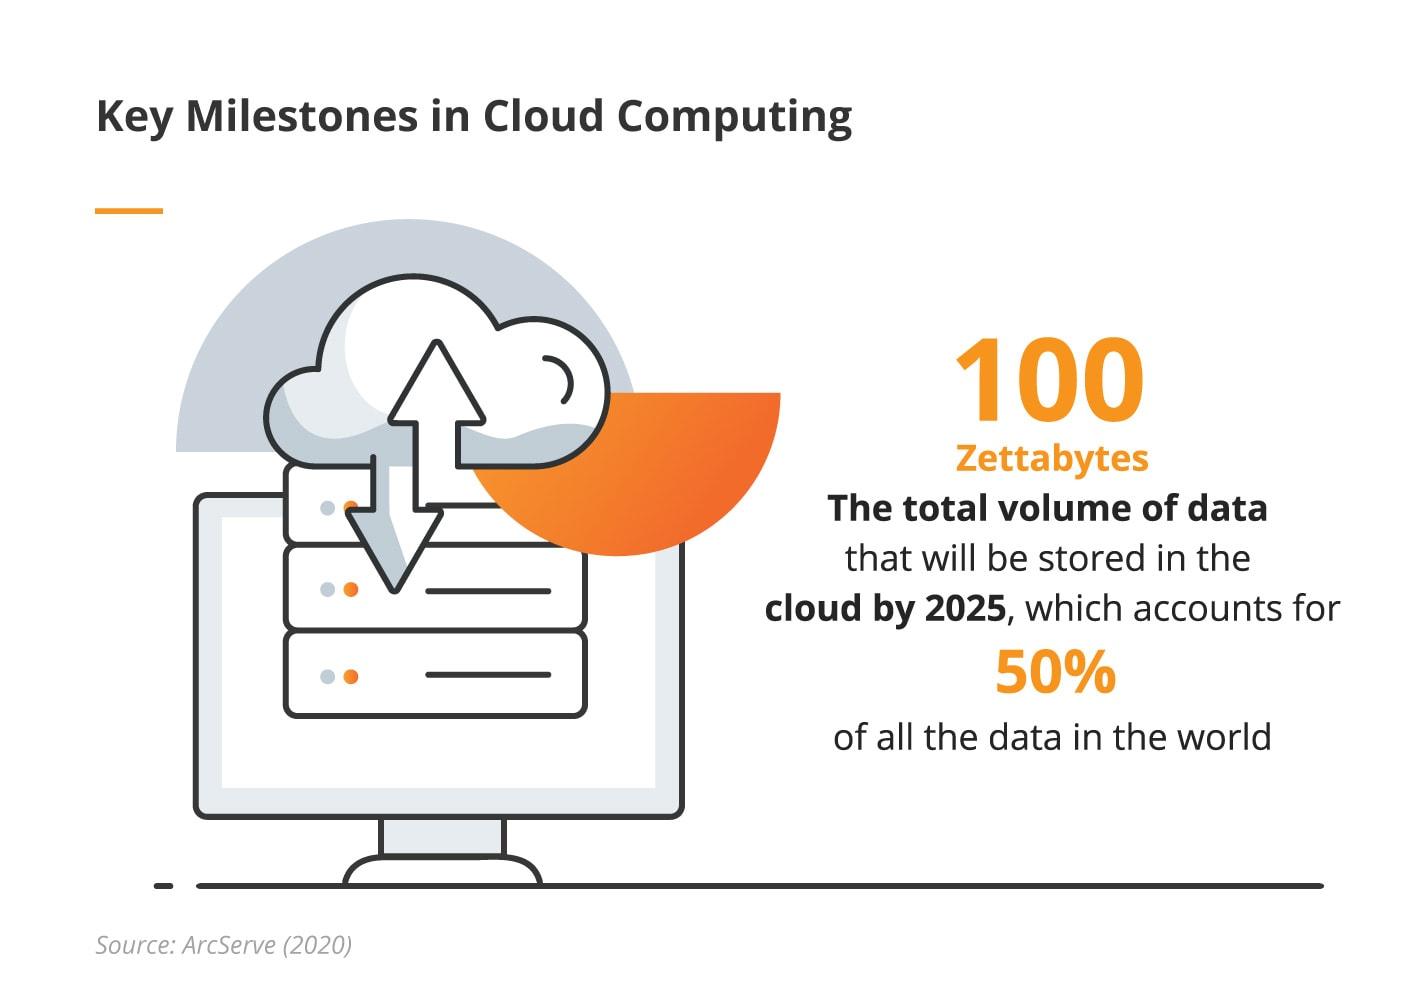 Milestones in cloud computing